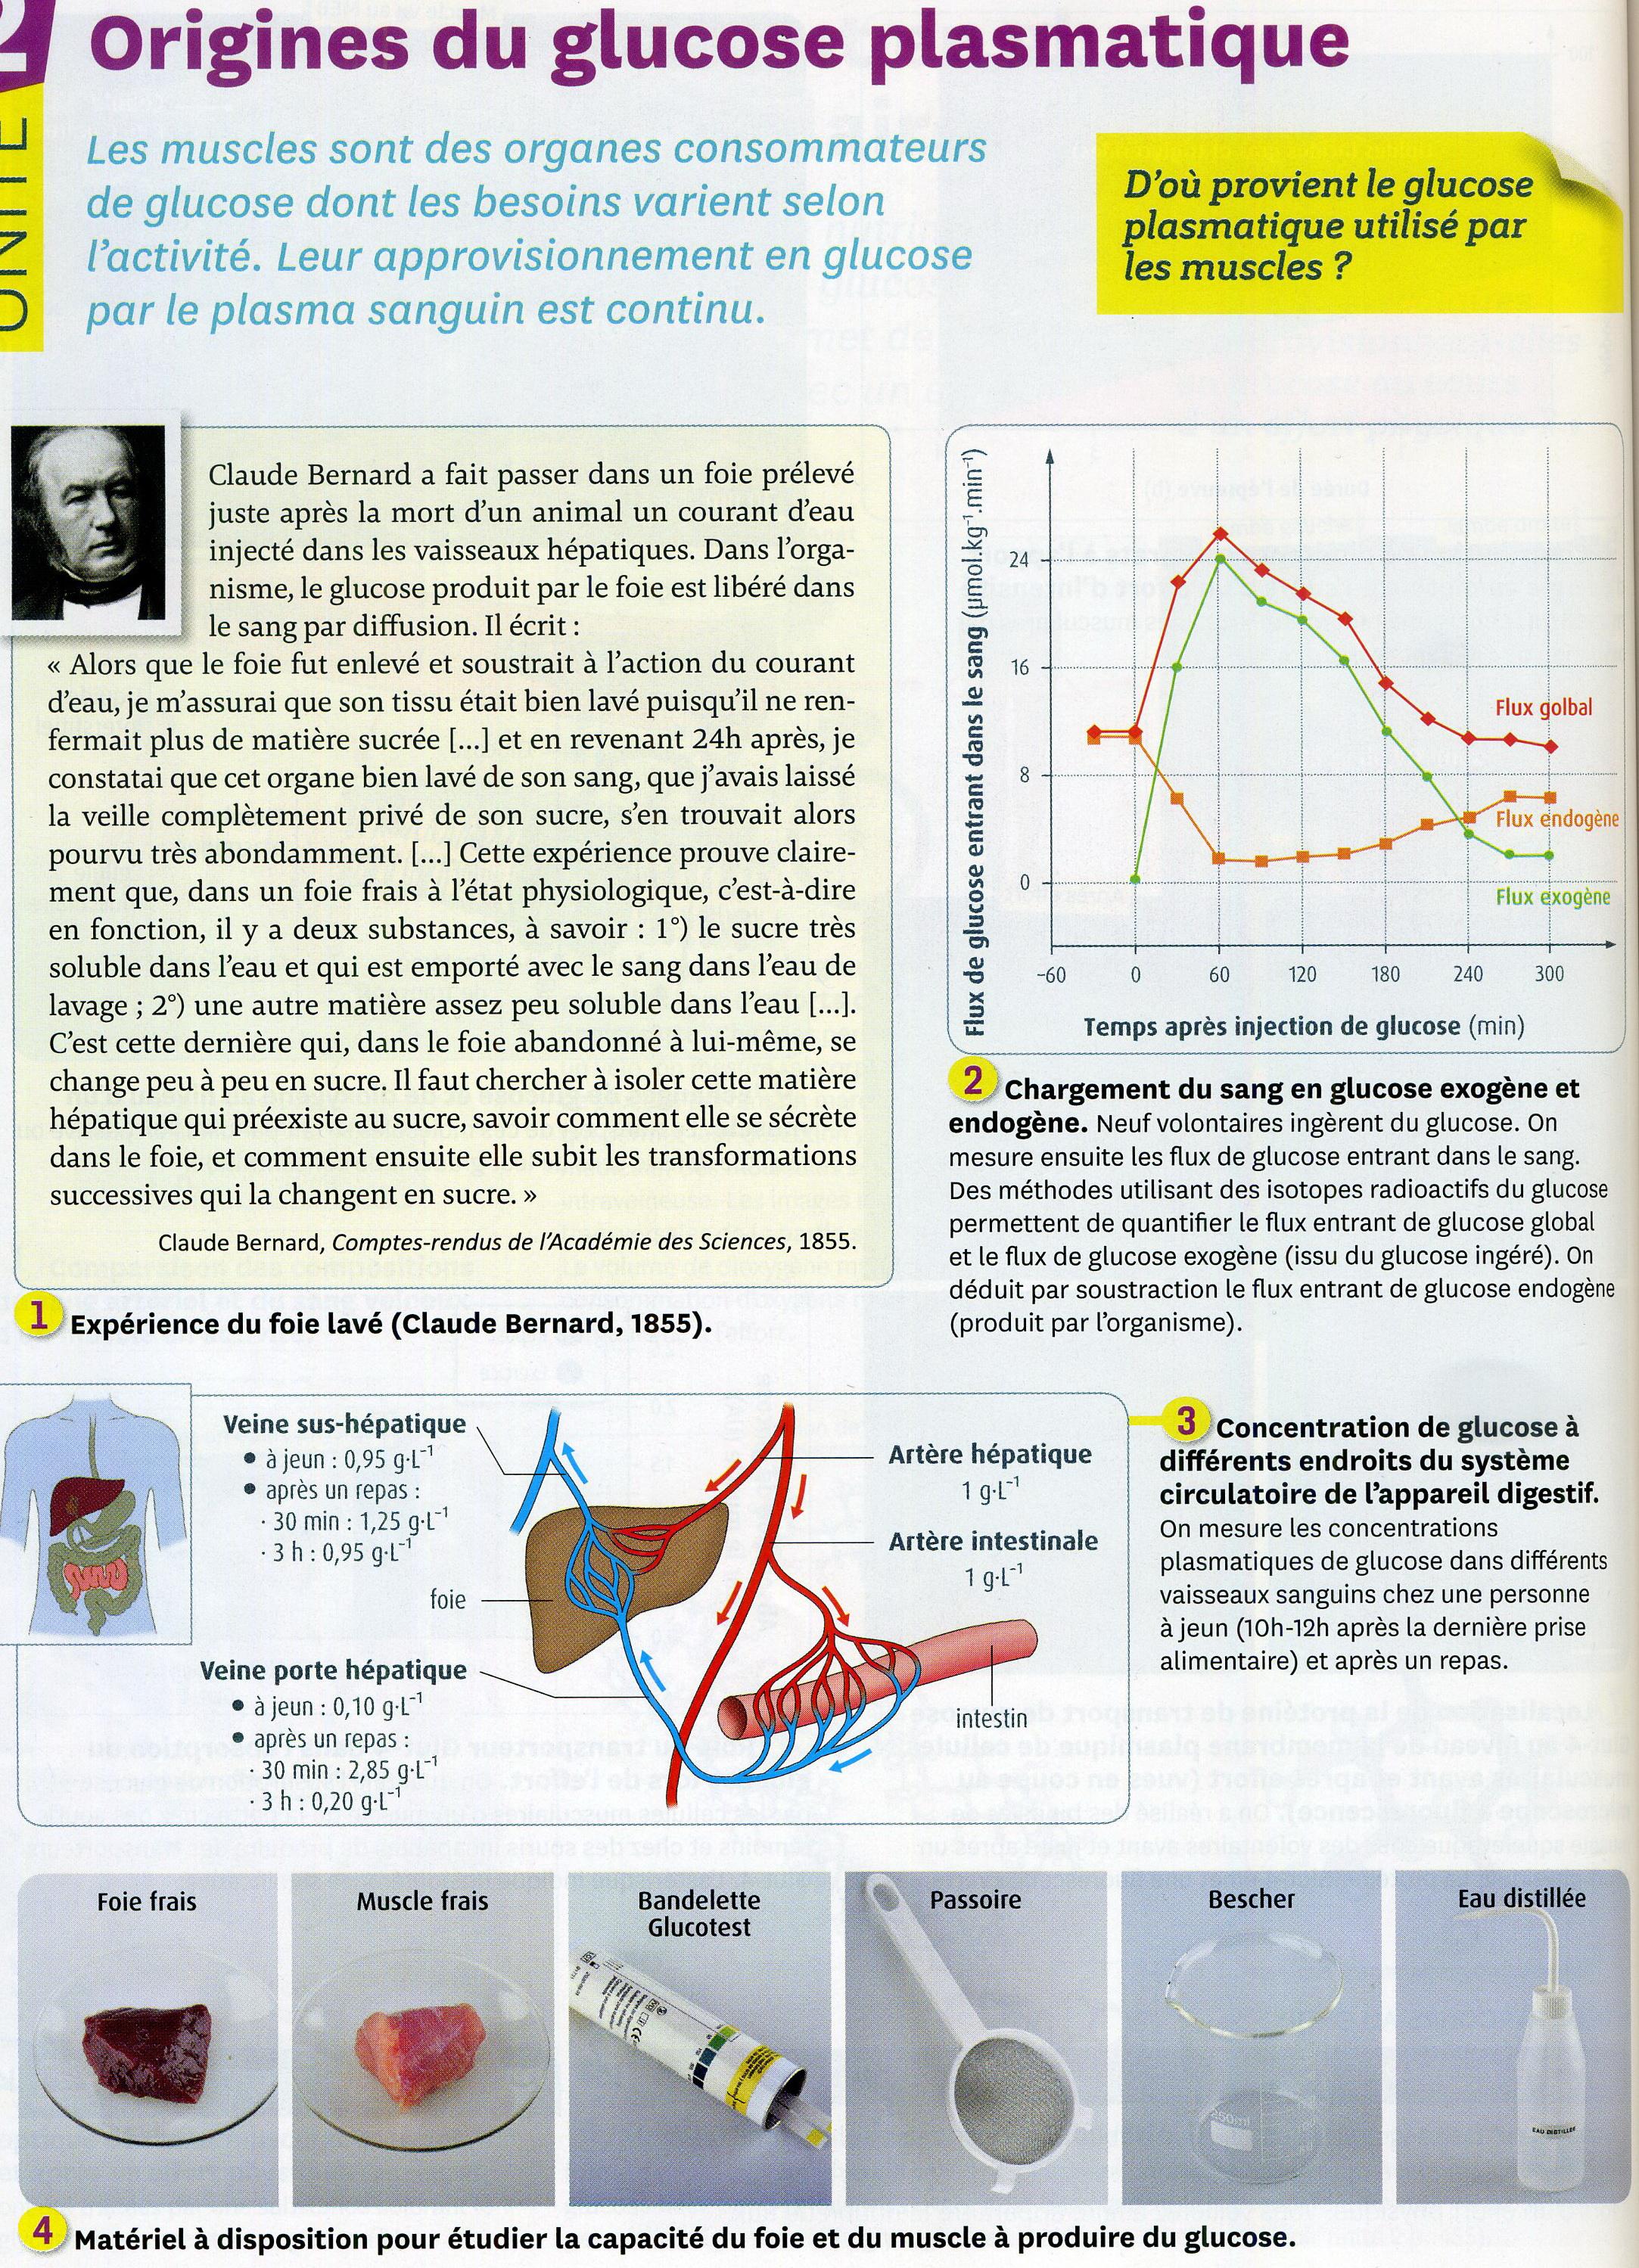 Activité 3 origine du glucose (1)